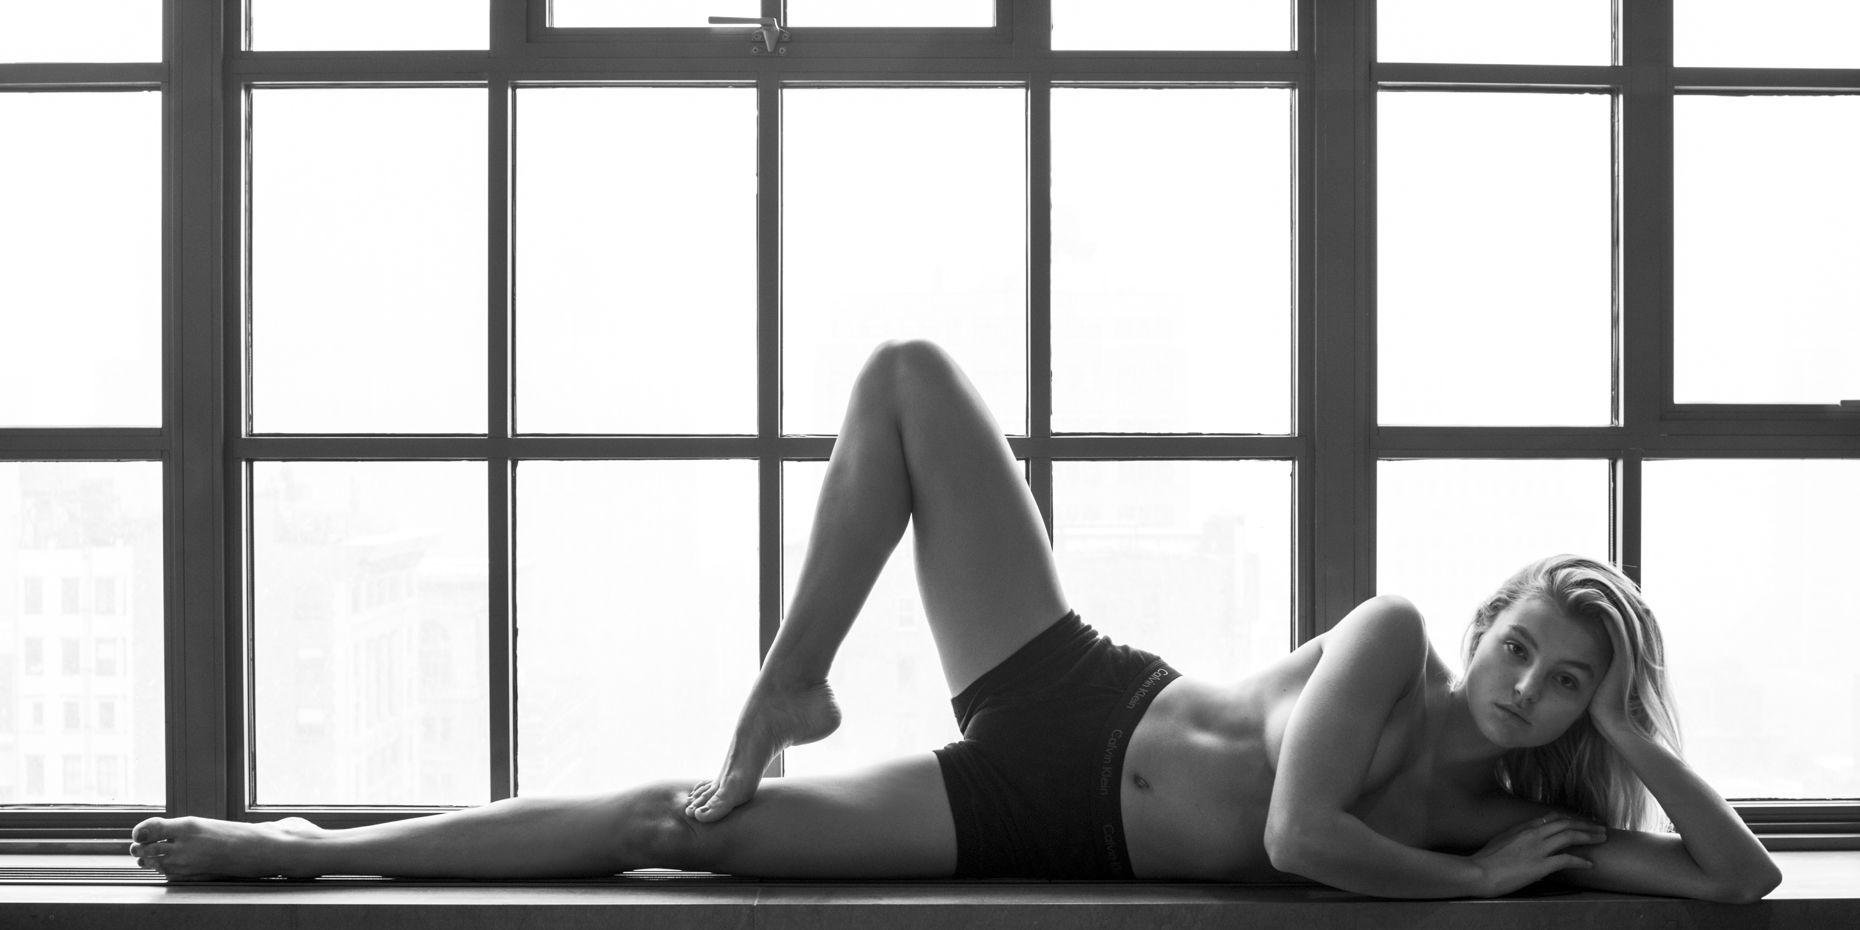 Rachel Hilbert Naked (2 New Photos) | #TheFappening: thefappening.so/rachel-hilbert-naked-2-new-photos